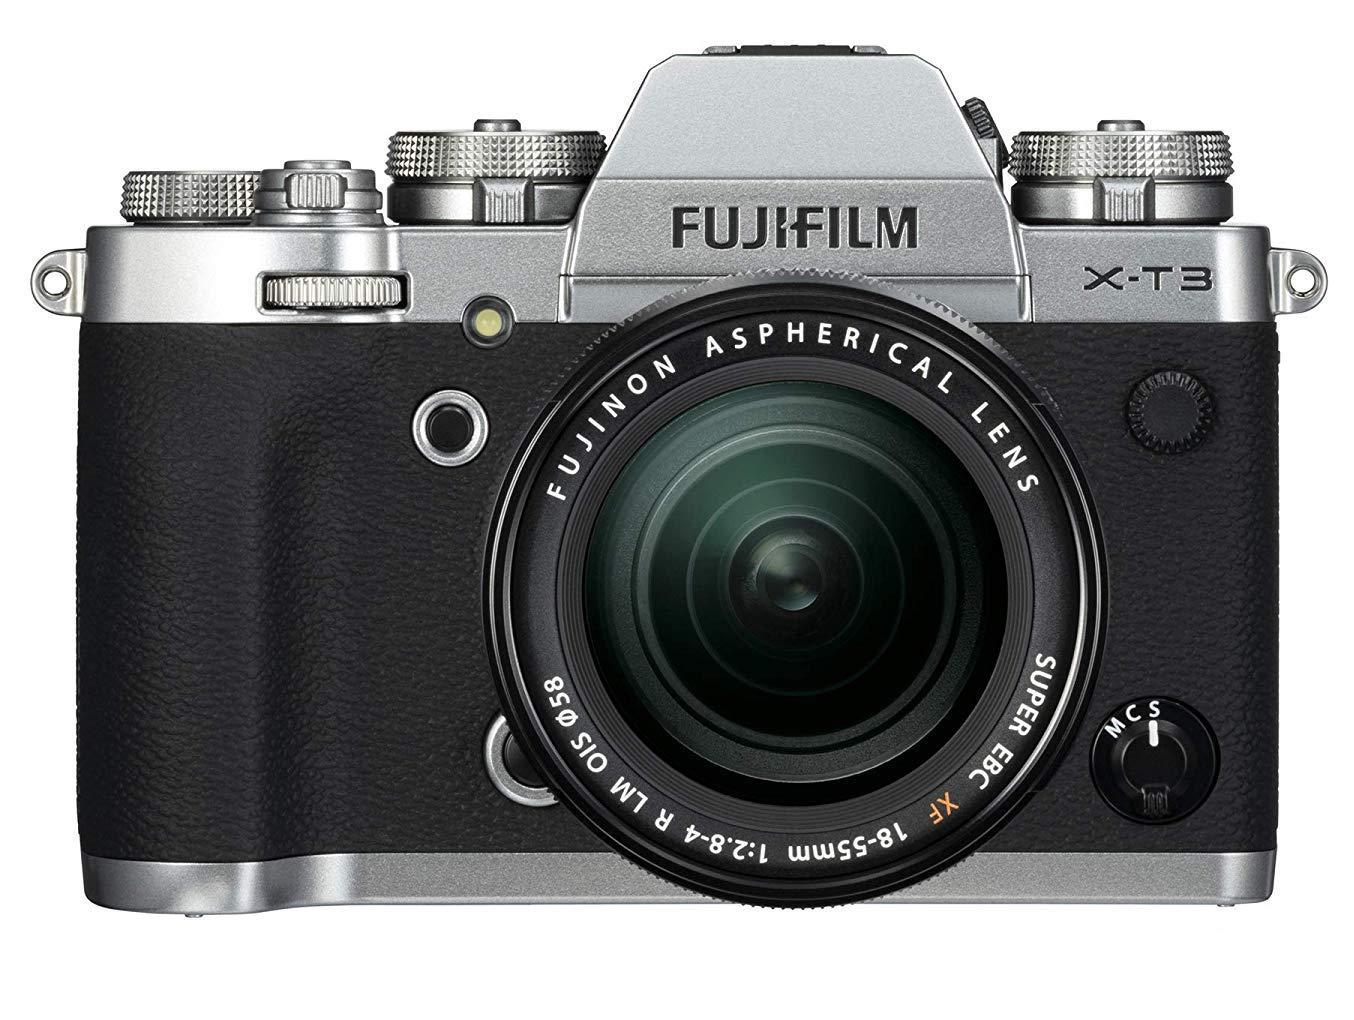 Fujifilm Mirrorless Camera with XF 18-55 mm Lens X-T3 26.1 MP 4K/60P Video